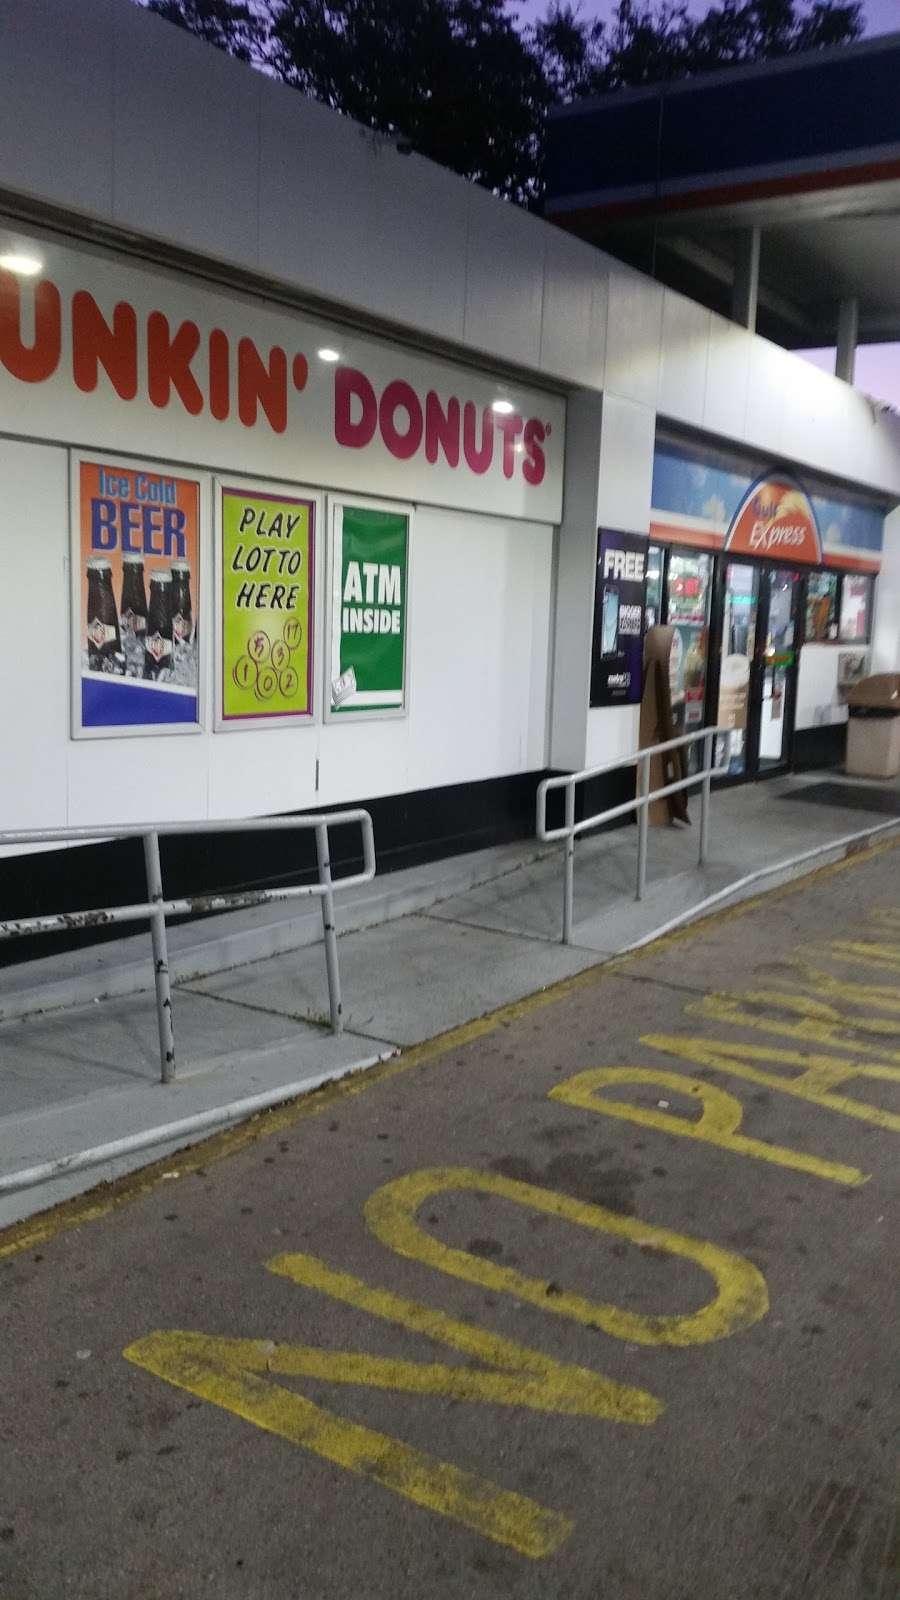 Dunkin Donuts - cafe    Photo 8 of 10   Address: Gulf Gas Station, 1939 Linden Blvd, Brooklyn, NY 11207, USA   Phone: (718) 272-5801